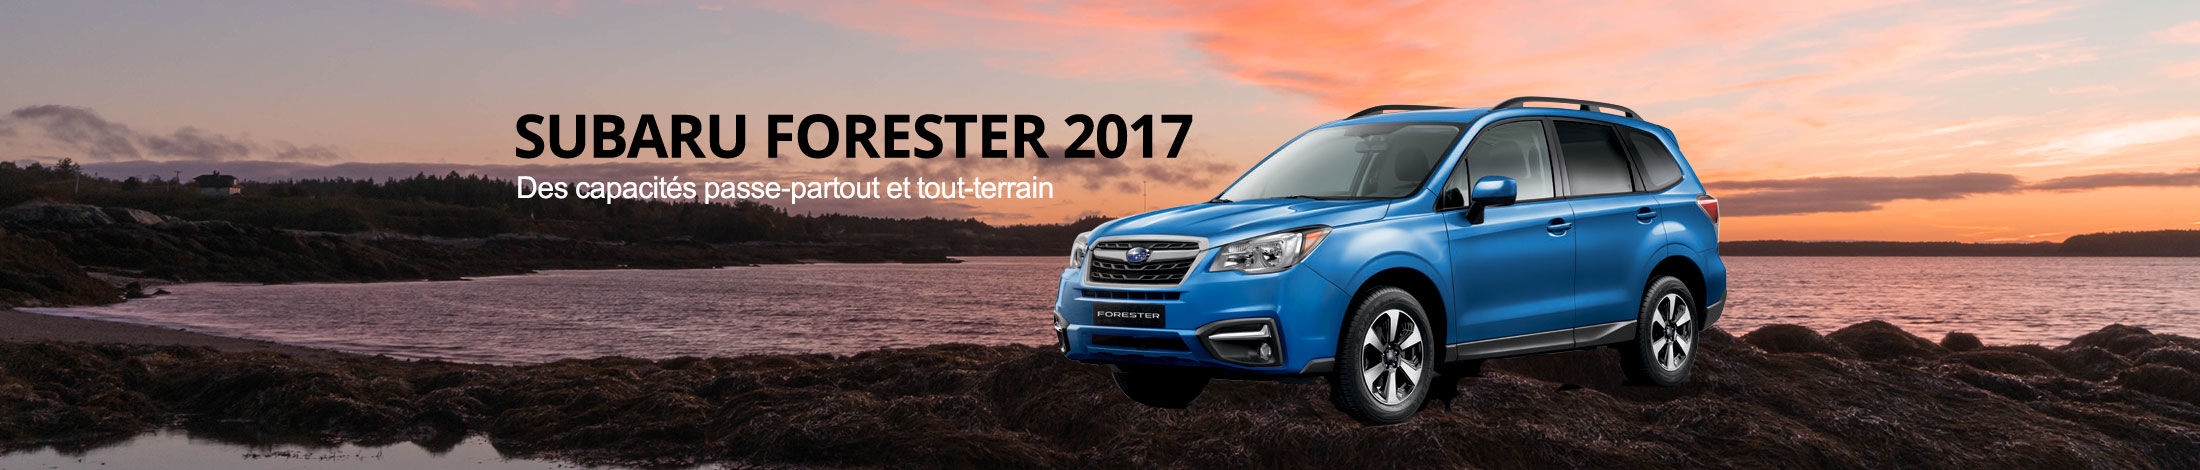 Header Subaru Forester 2017